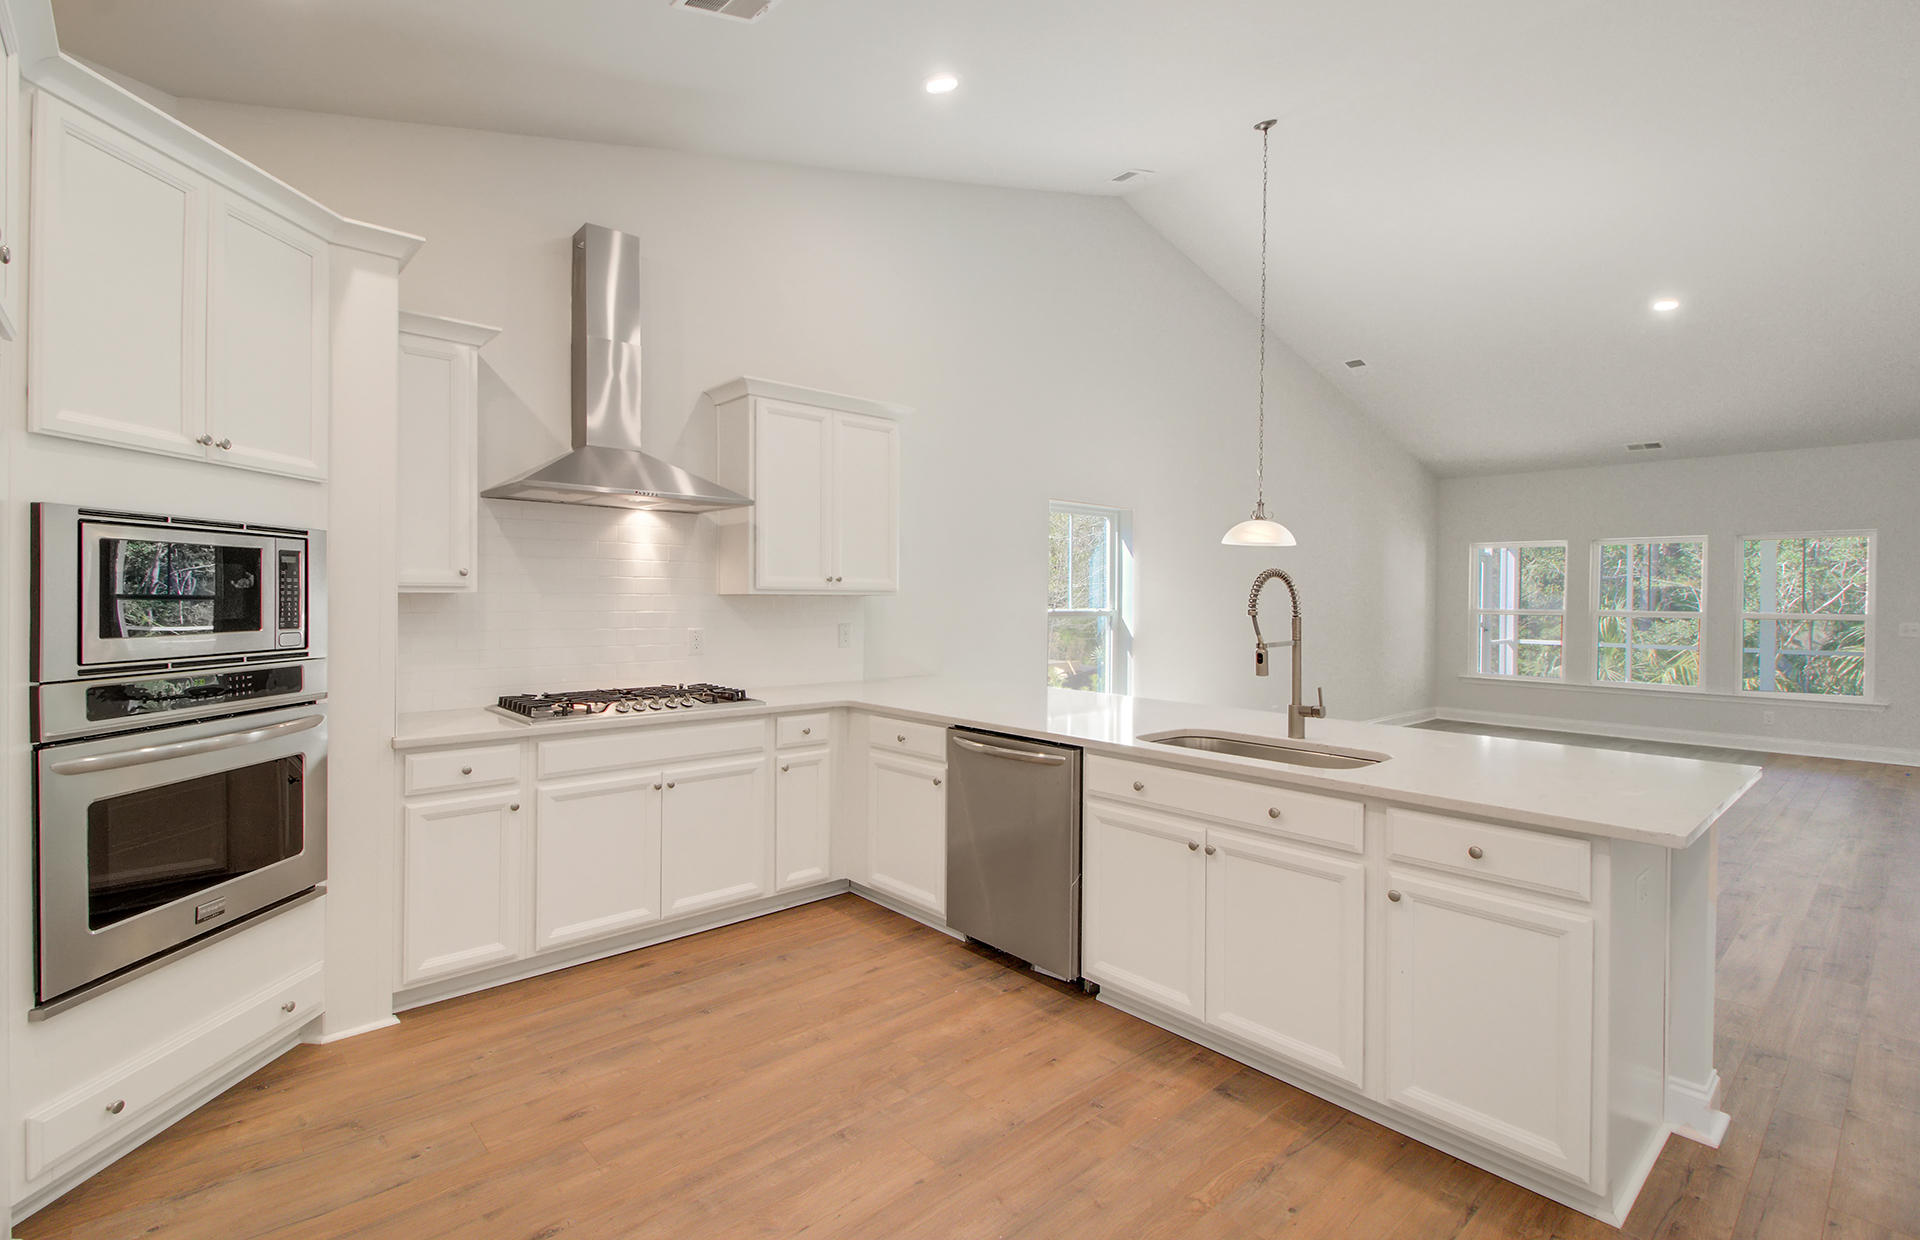 Park West Homes For Sale - 3062 Rice Field, Mount Pleasant, SC - 20